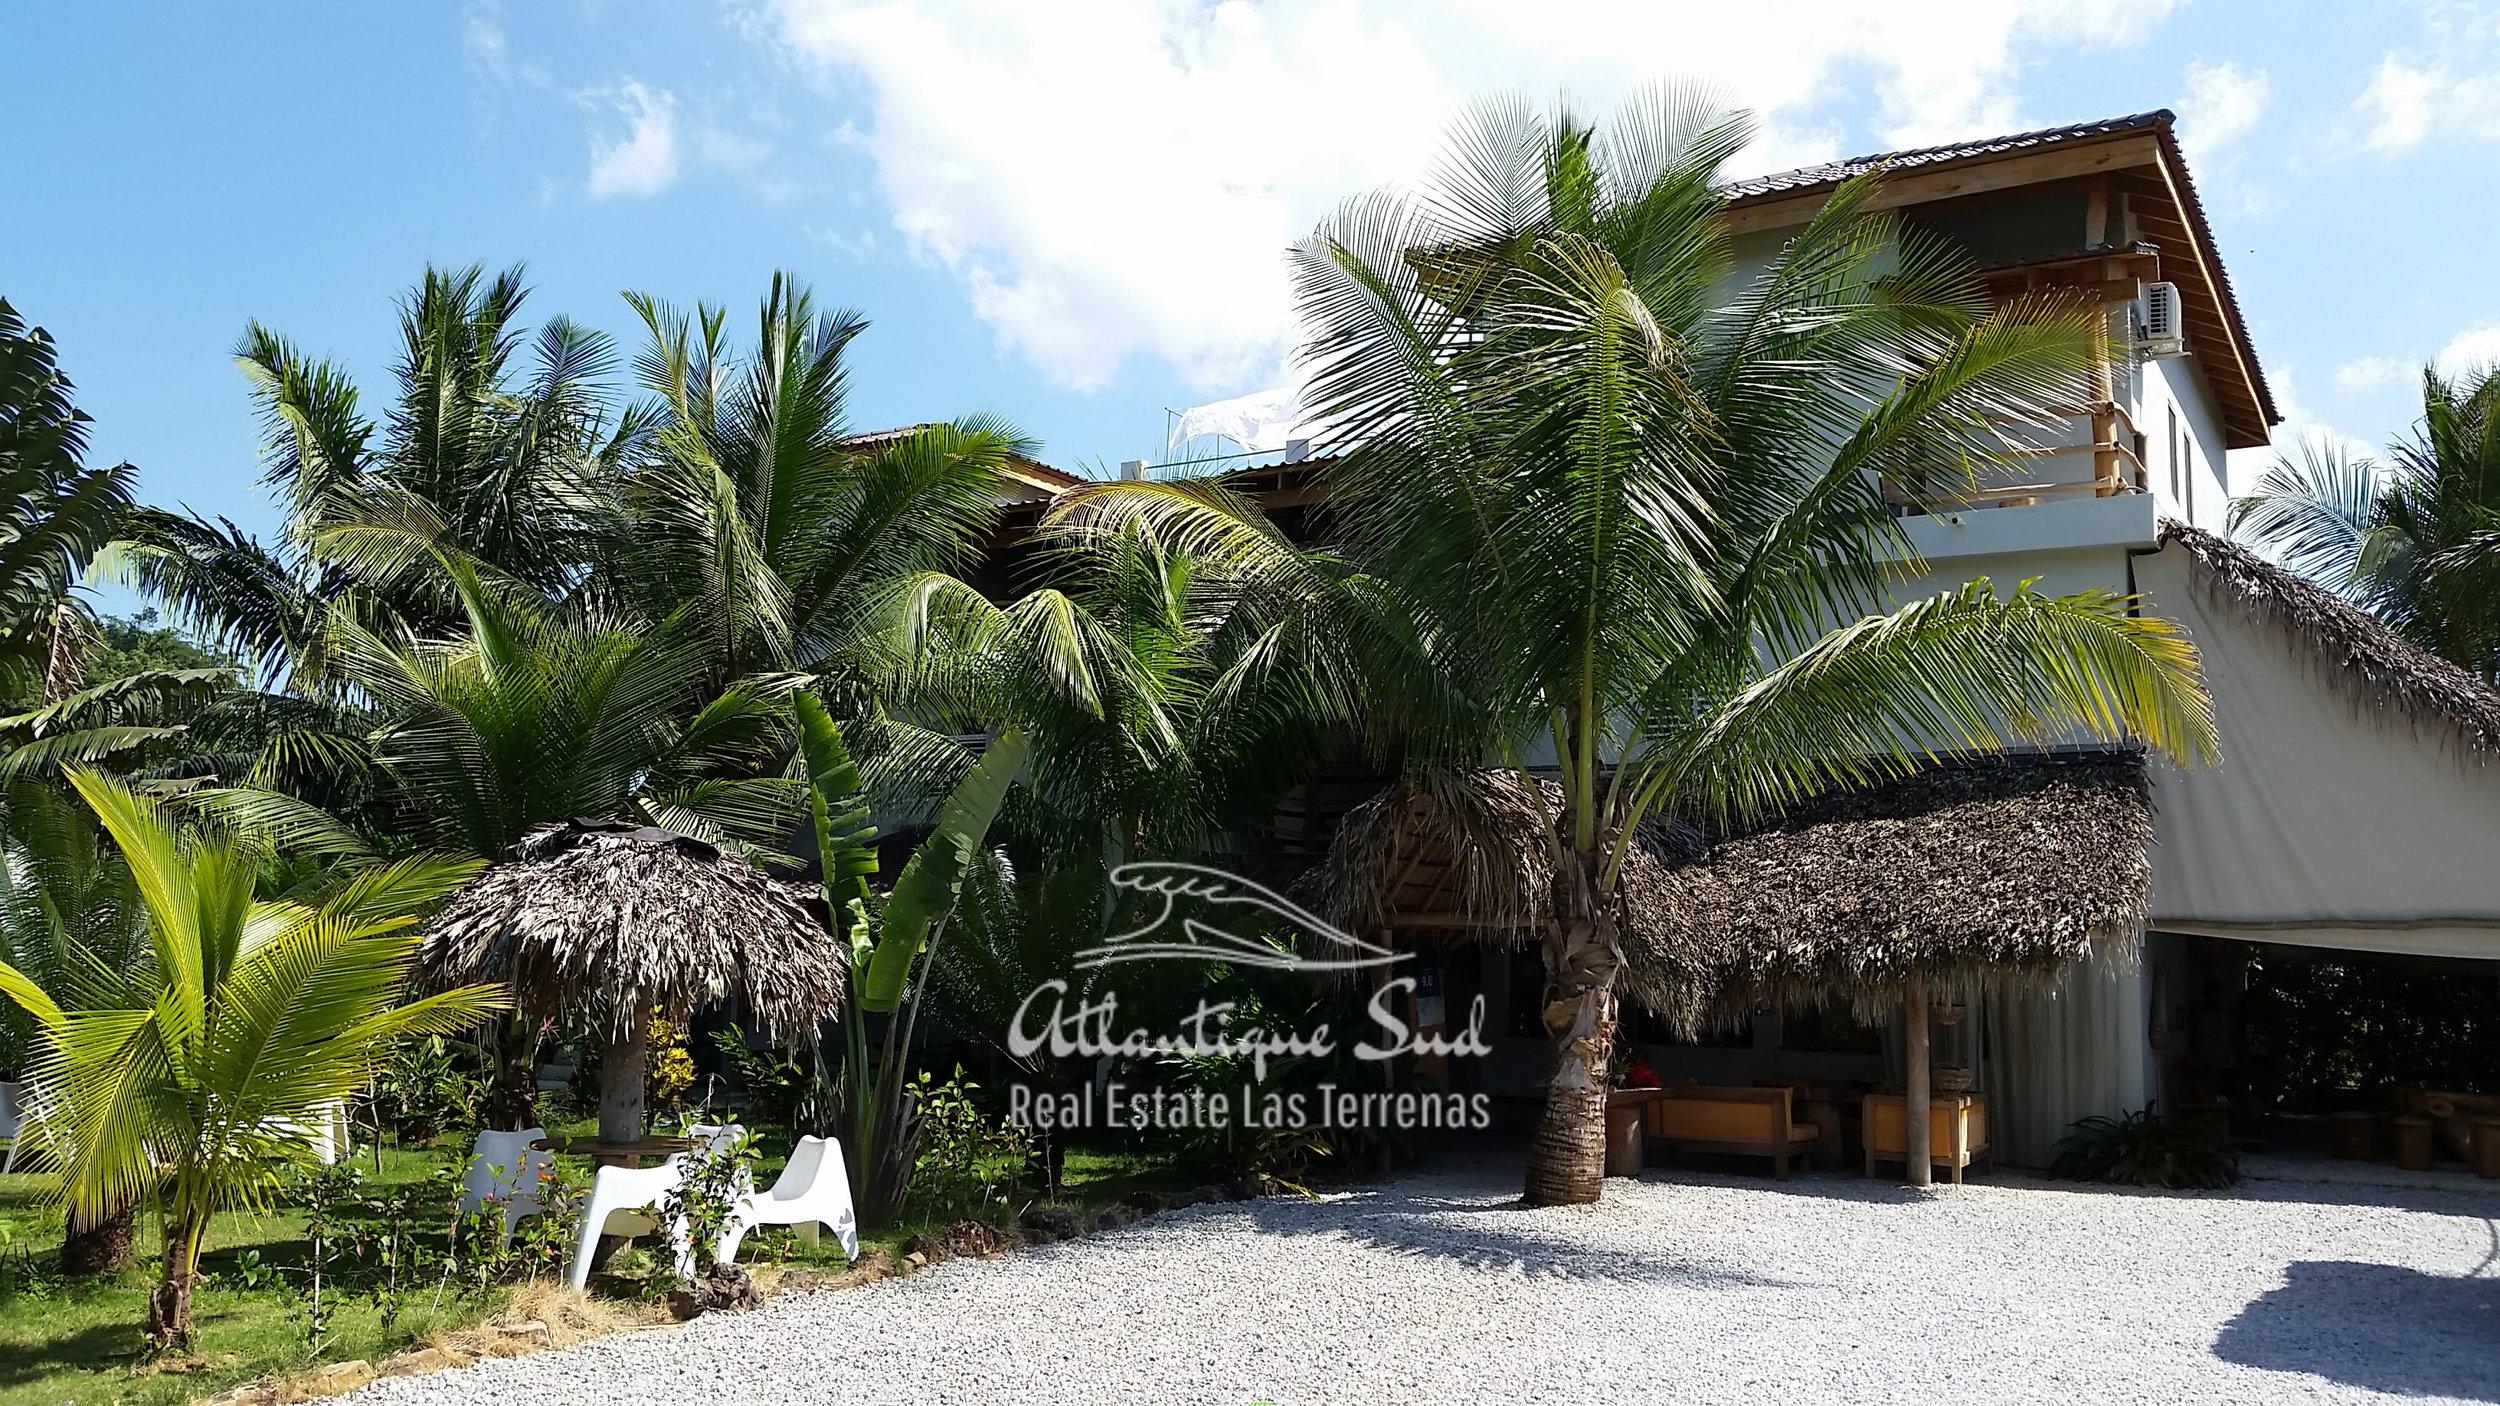 Typical caribbean hotel for sale Real Estate Las Terrenas Dominican Republic Atlantique Sud31.jpg